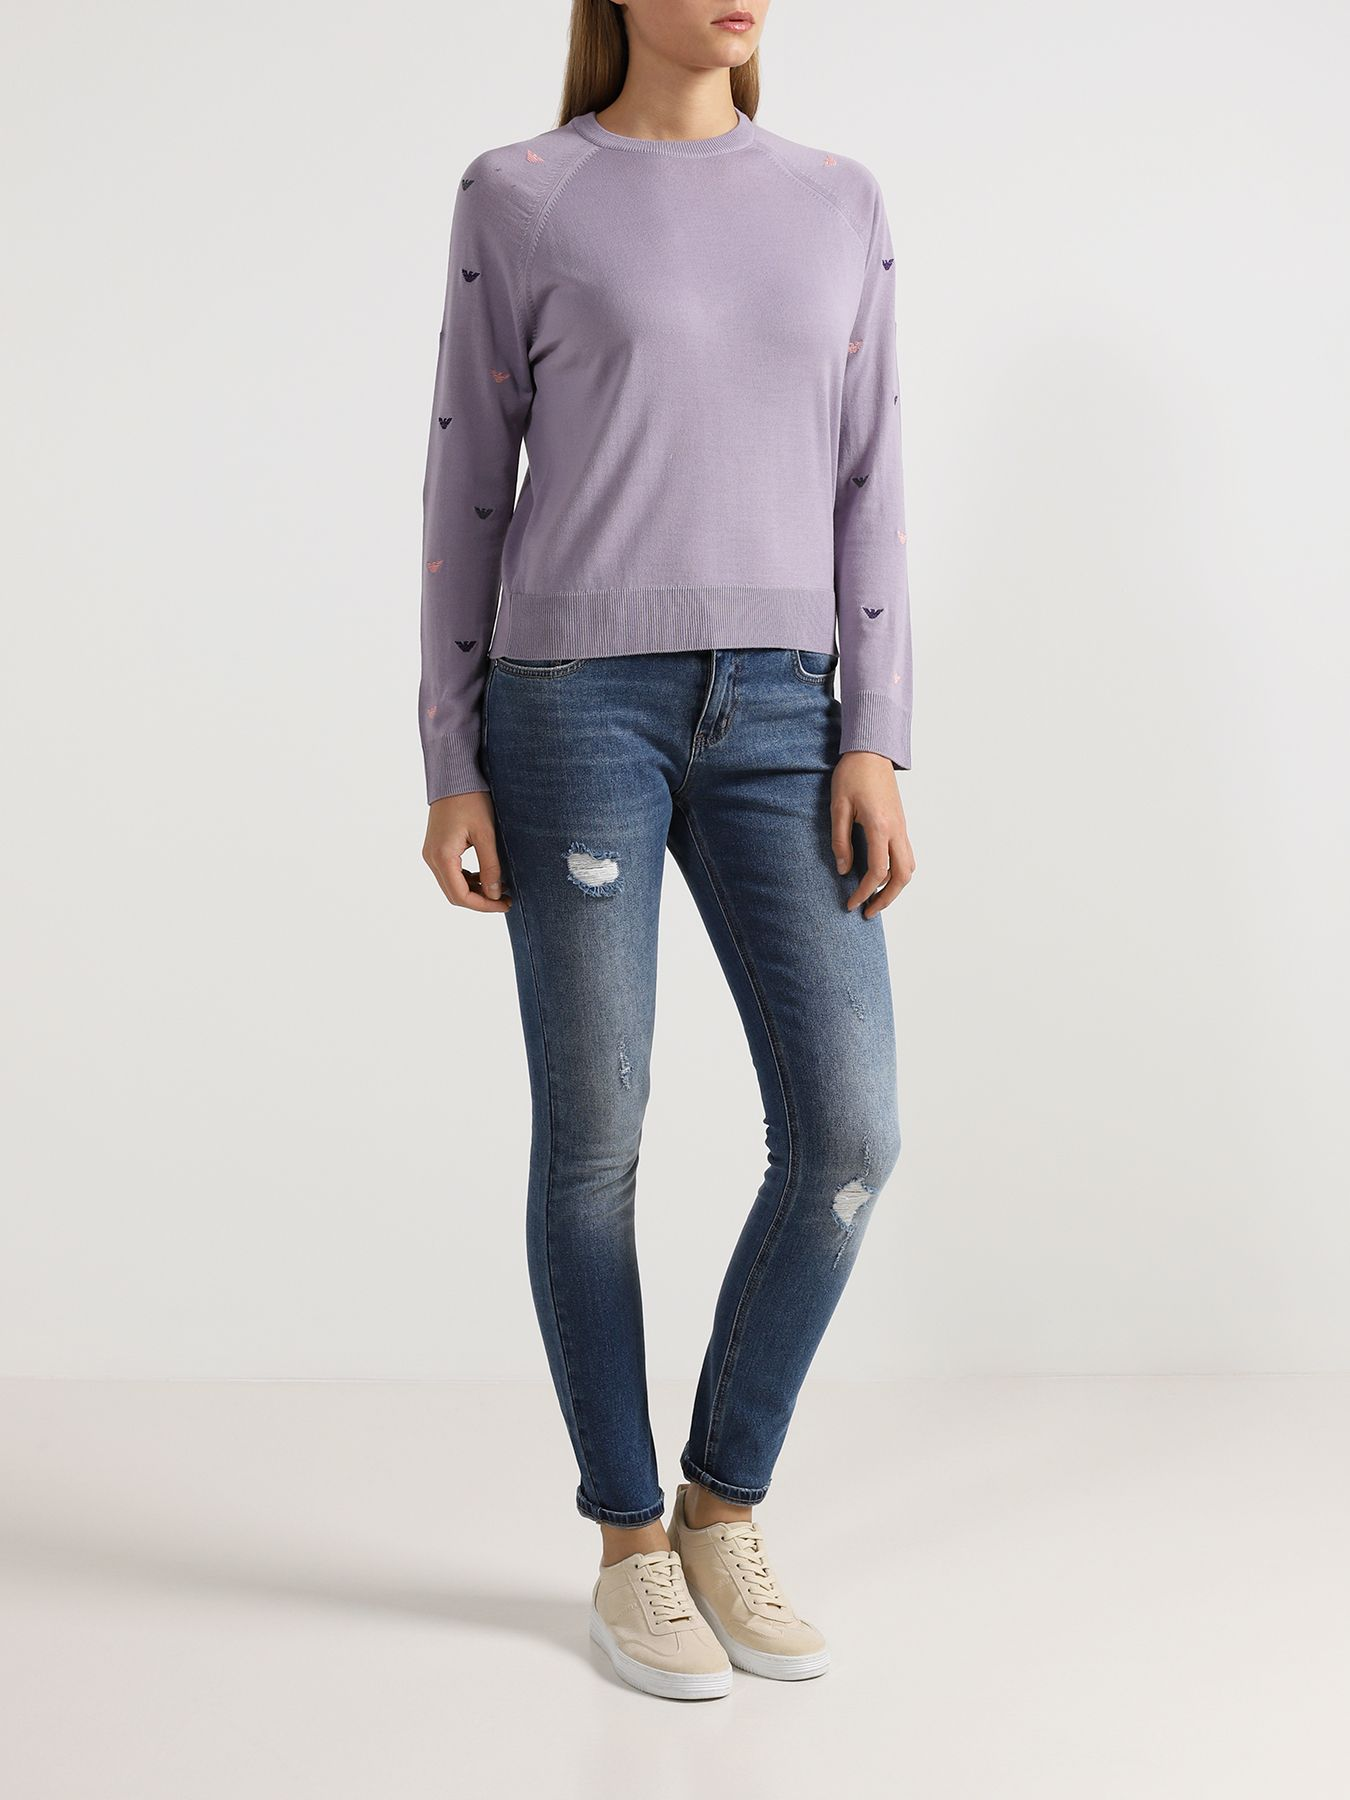 Брюки Finisterre Джинсы с потертостями levi s синие джинсы с потертостями 512™ slim taper fit